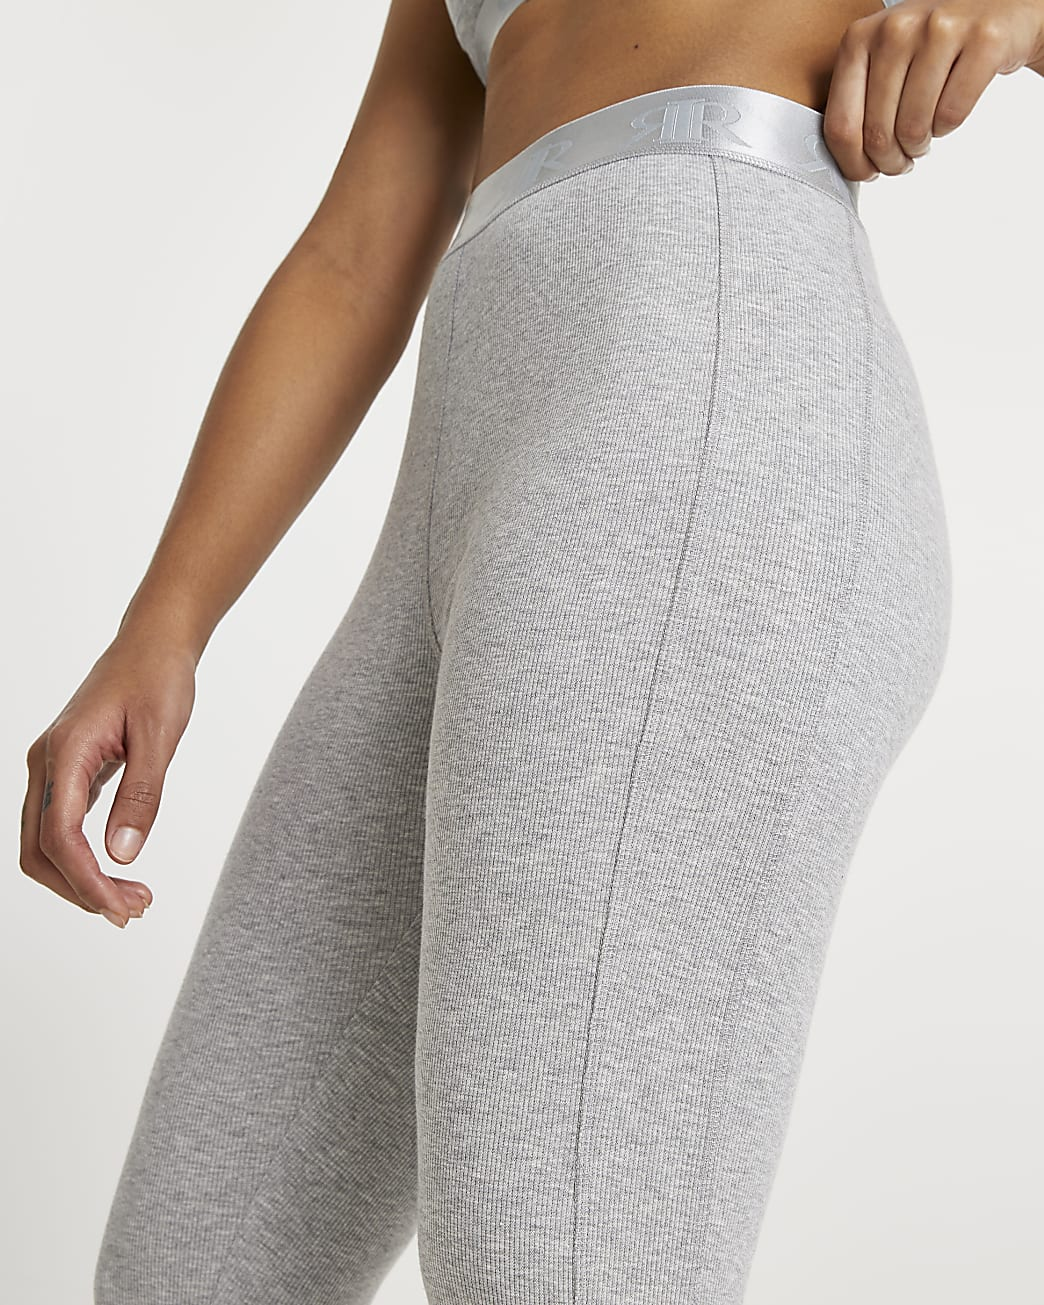 Intimates grey seam detail leggings